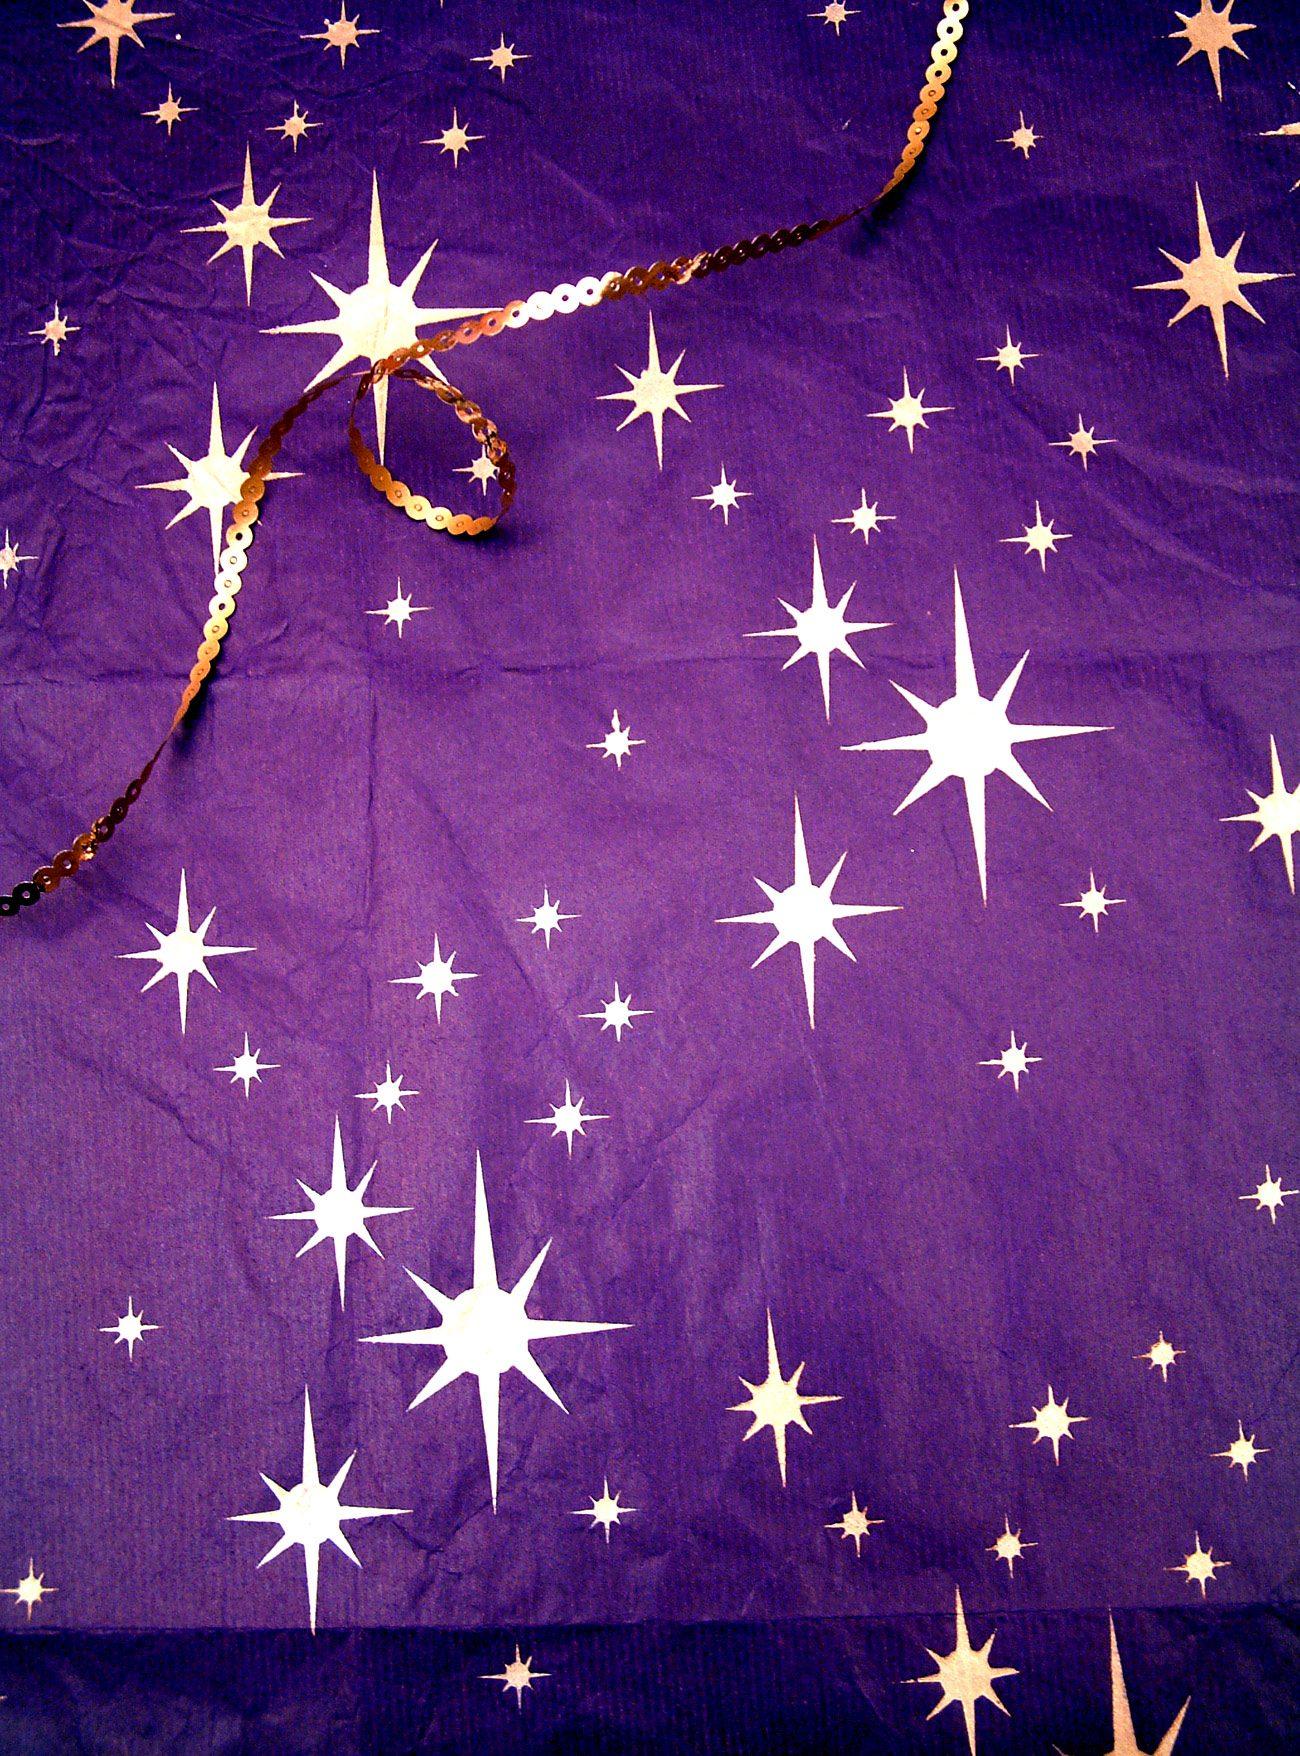 Small star cluster stencil henny donovan motif small star cluster stencil amipublicfo Images